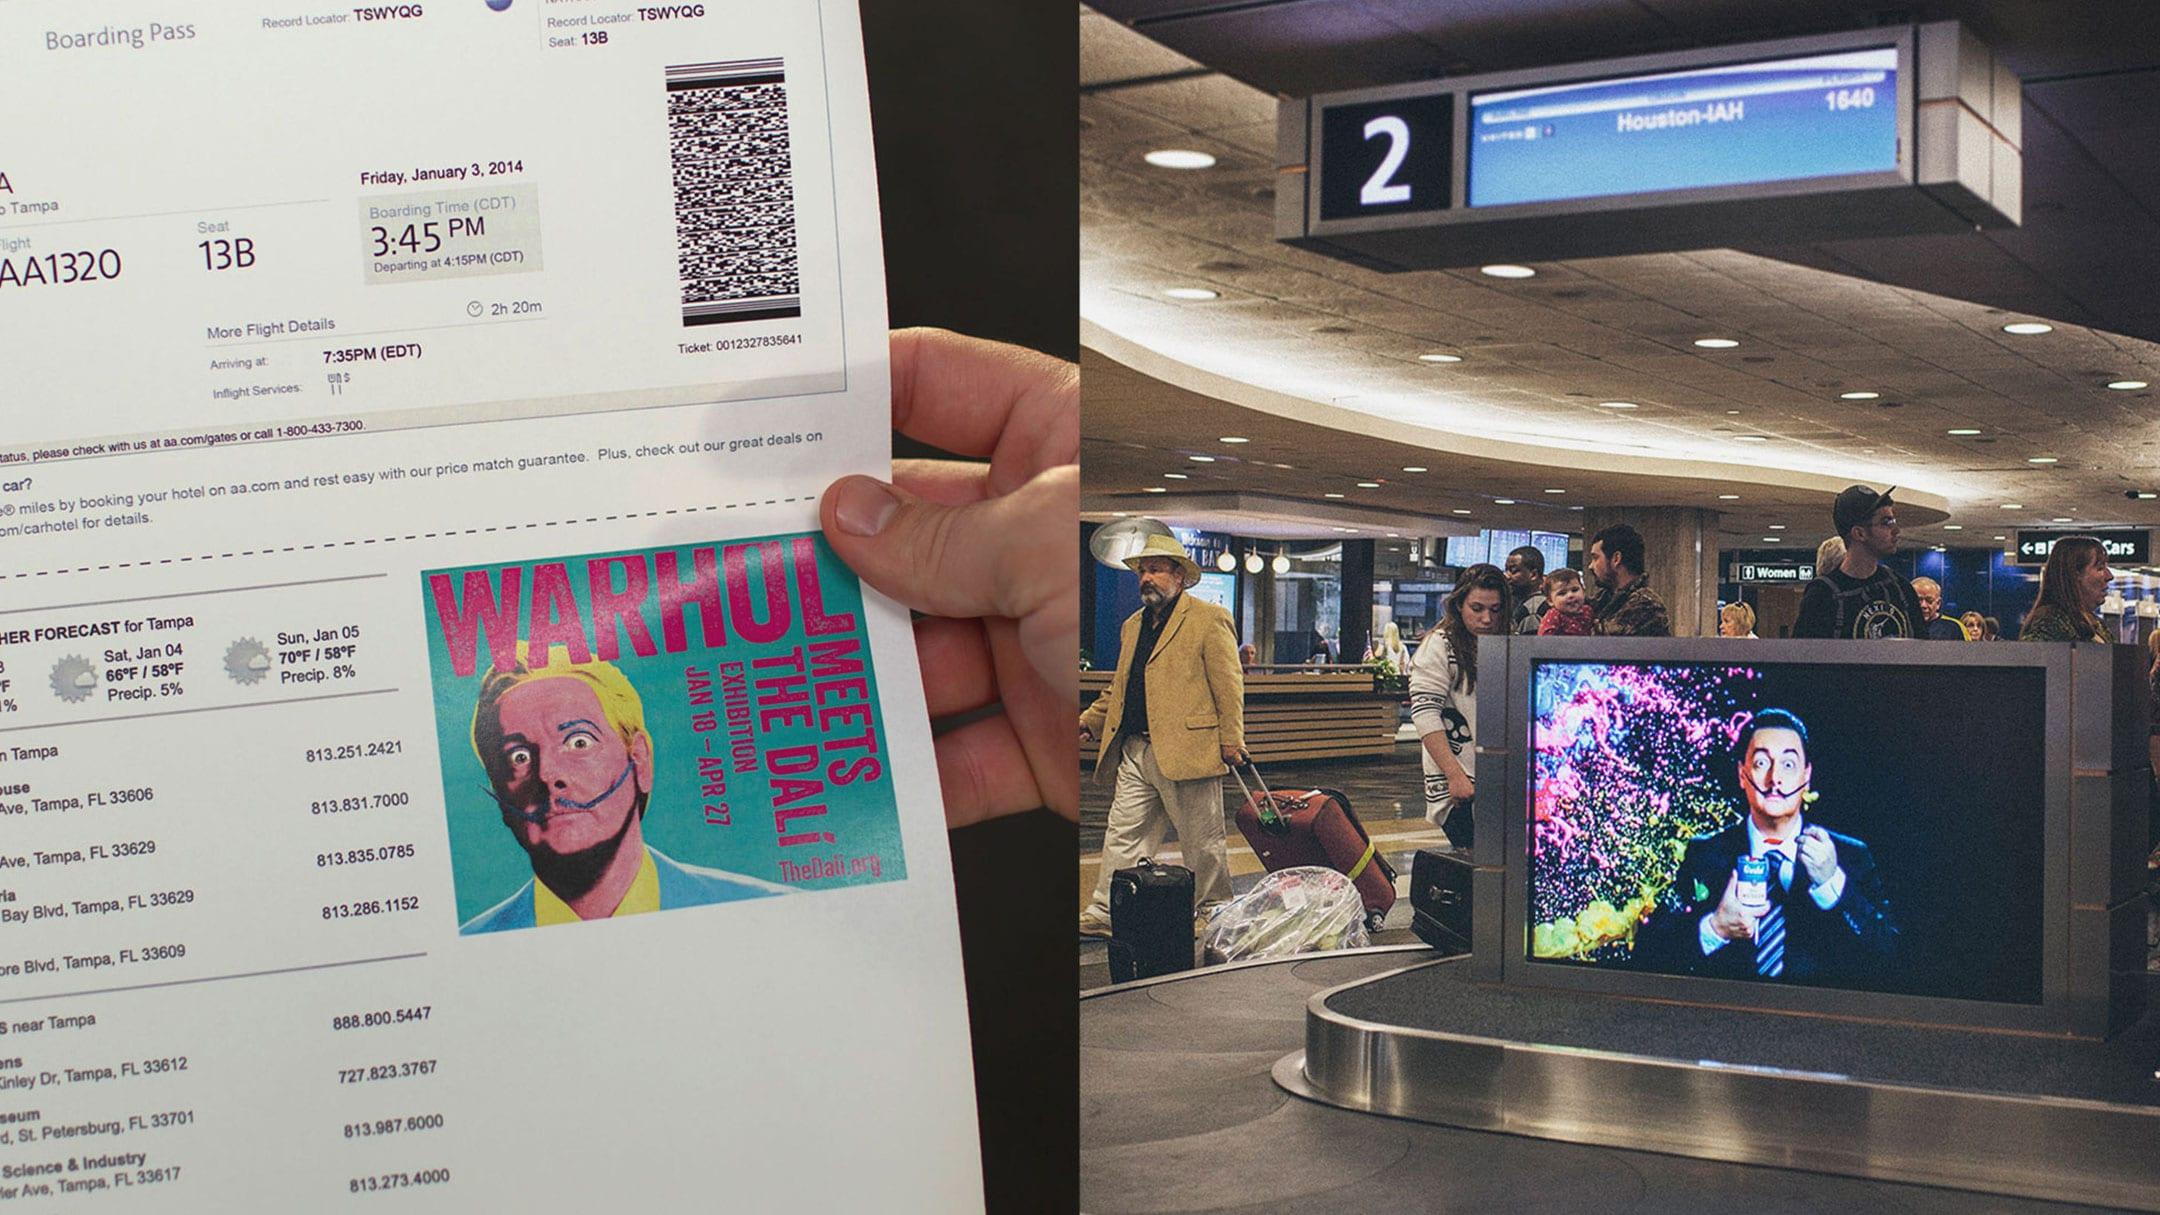 Tv image of Dali at the airport